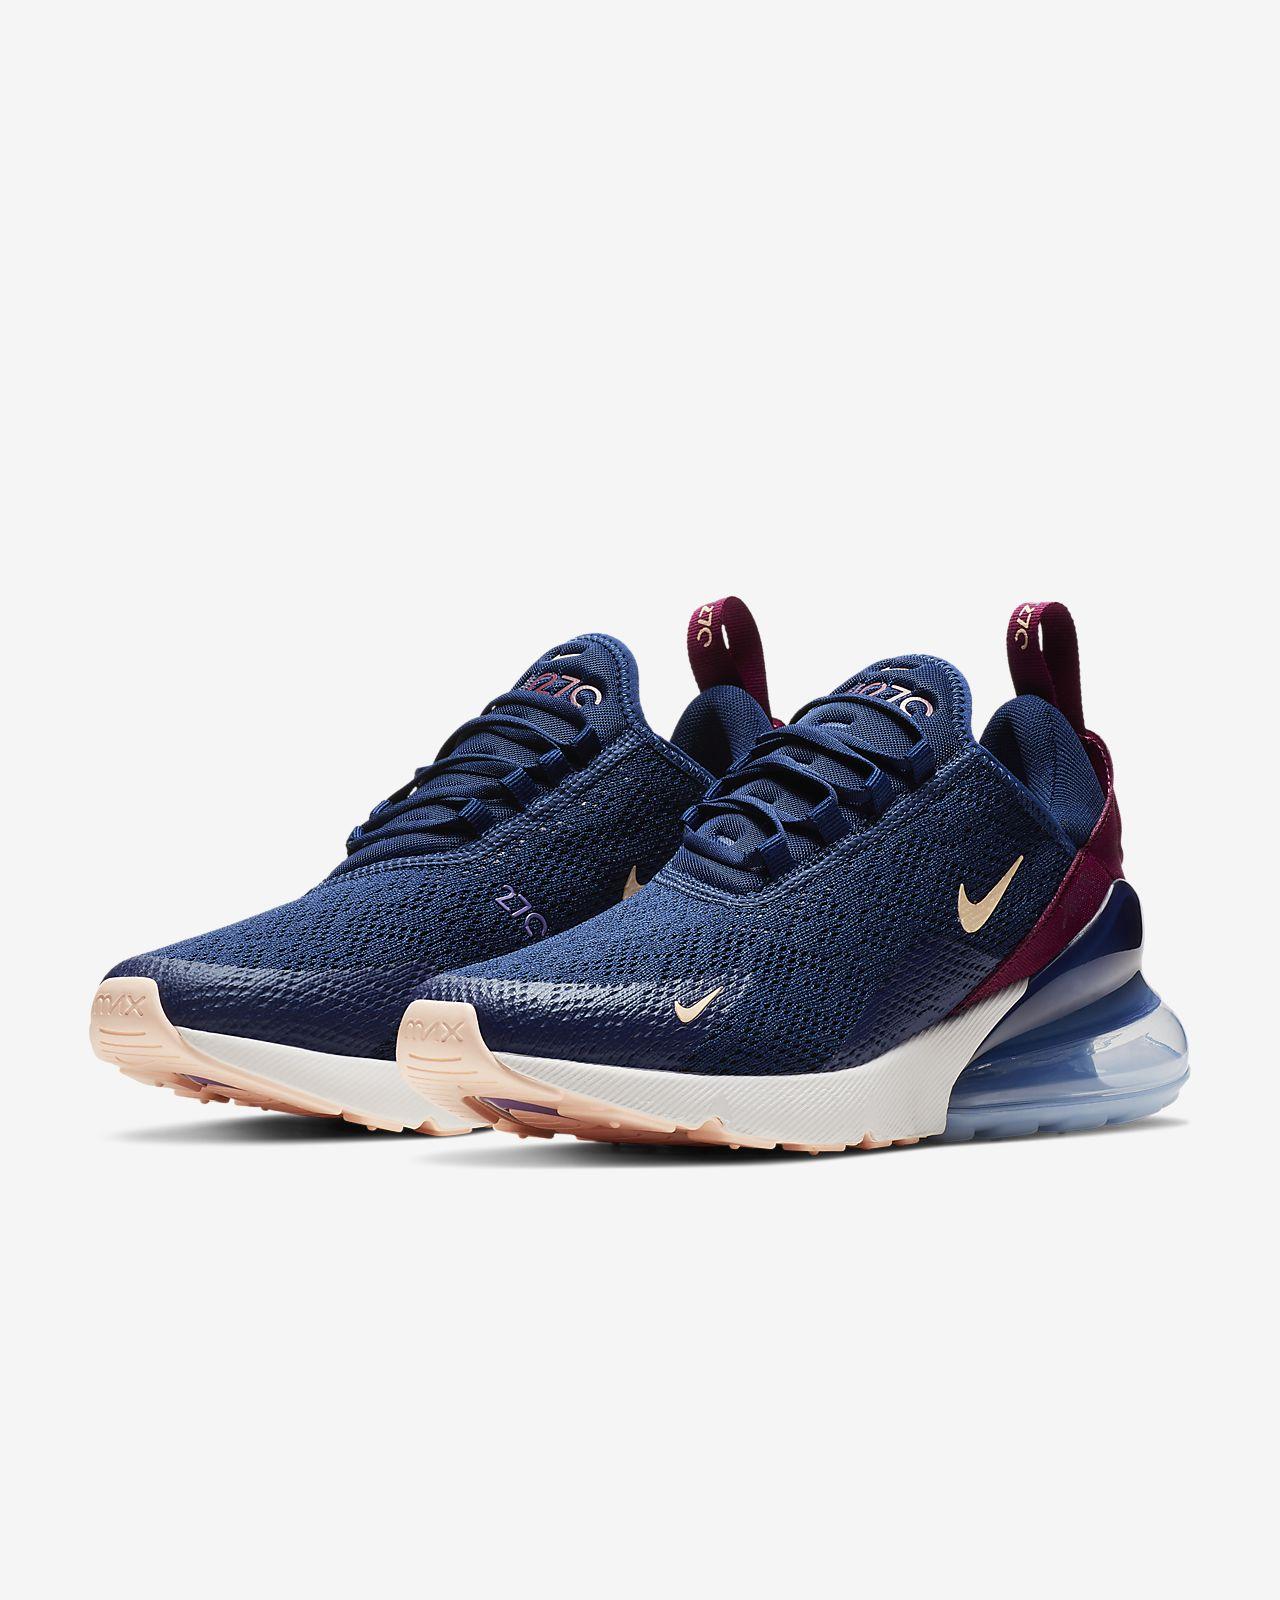 d5253010d7ba Nike Air Max 270 Women s Shoe. Nike.com AU